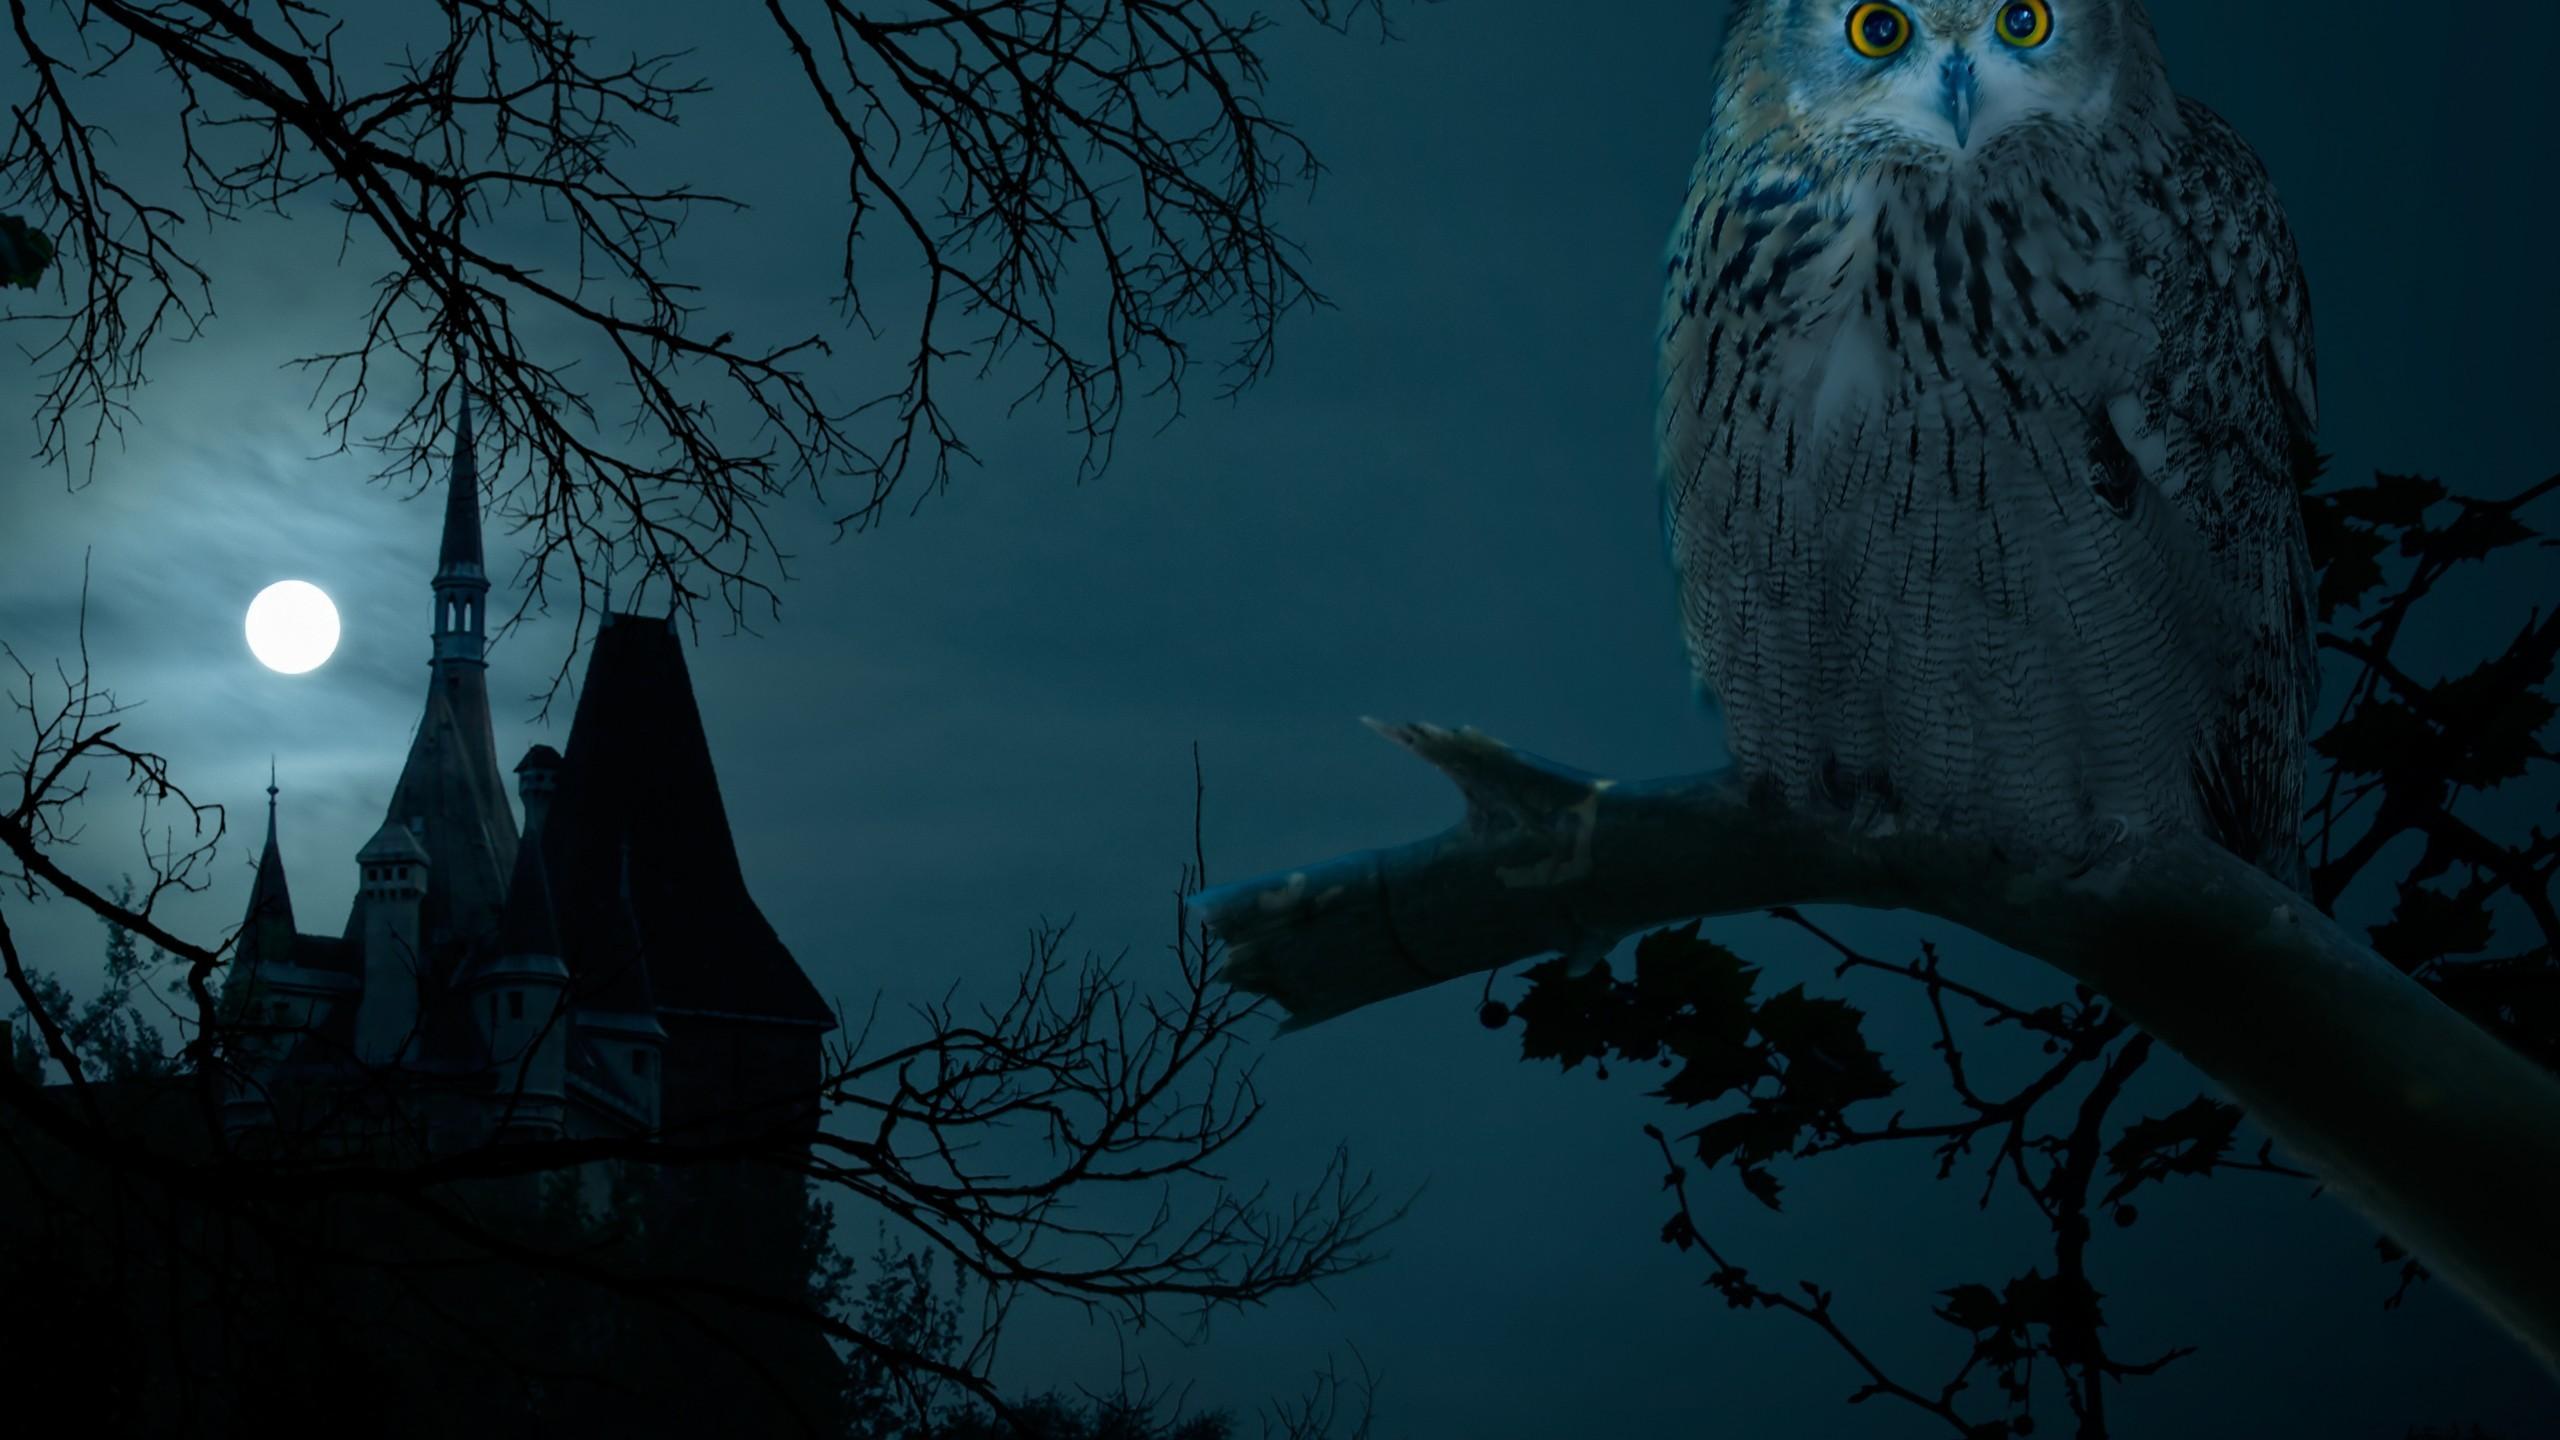 Halloween Night Owl Hounted Wallpapers HD 4k High Definition 2560x1440